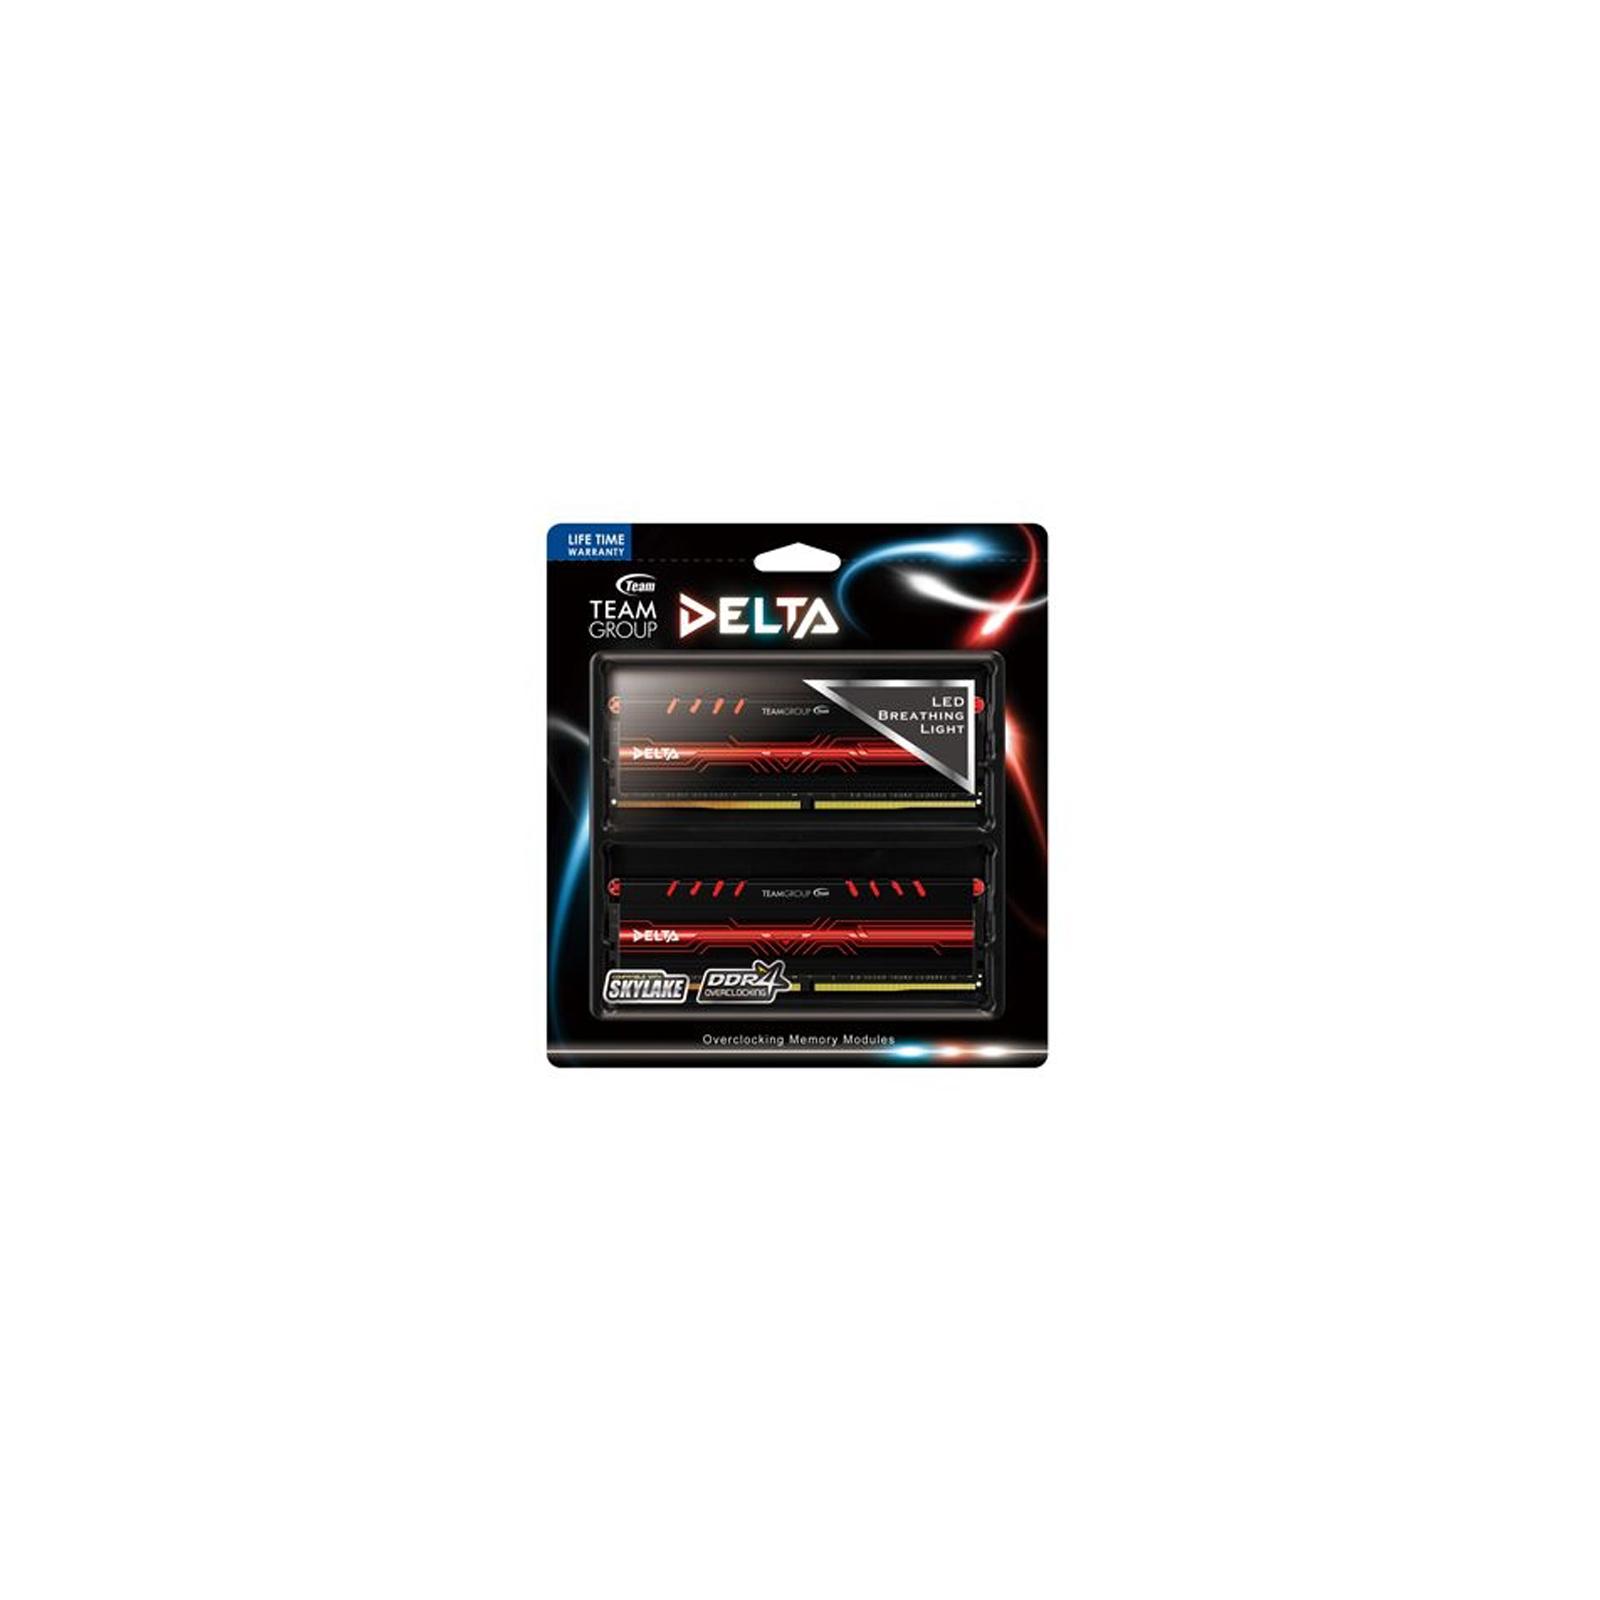 Модуль памяти для компьютера DDR4 8GB (2x4GB) 3000 MHz Delta Red LED Team (TDTRD48G3000HC16ADC01) изображение 3